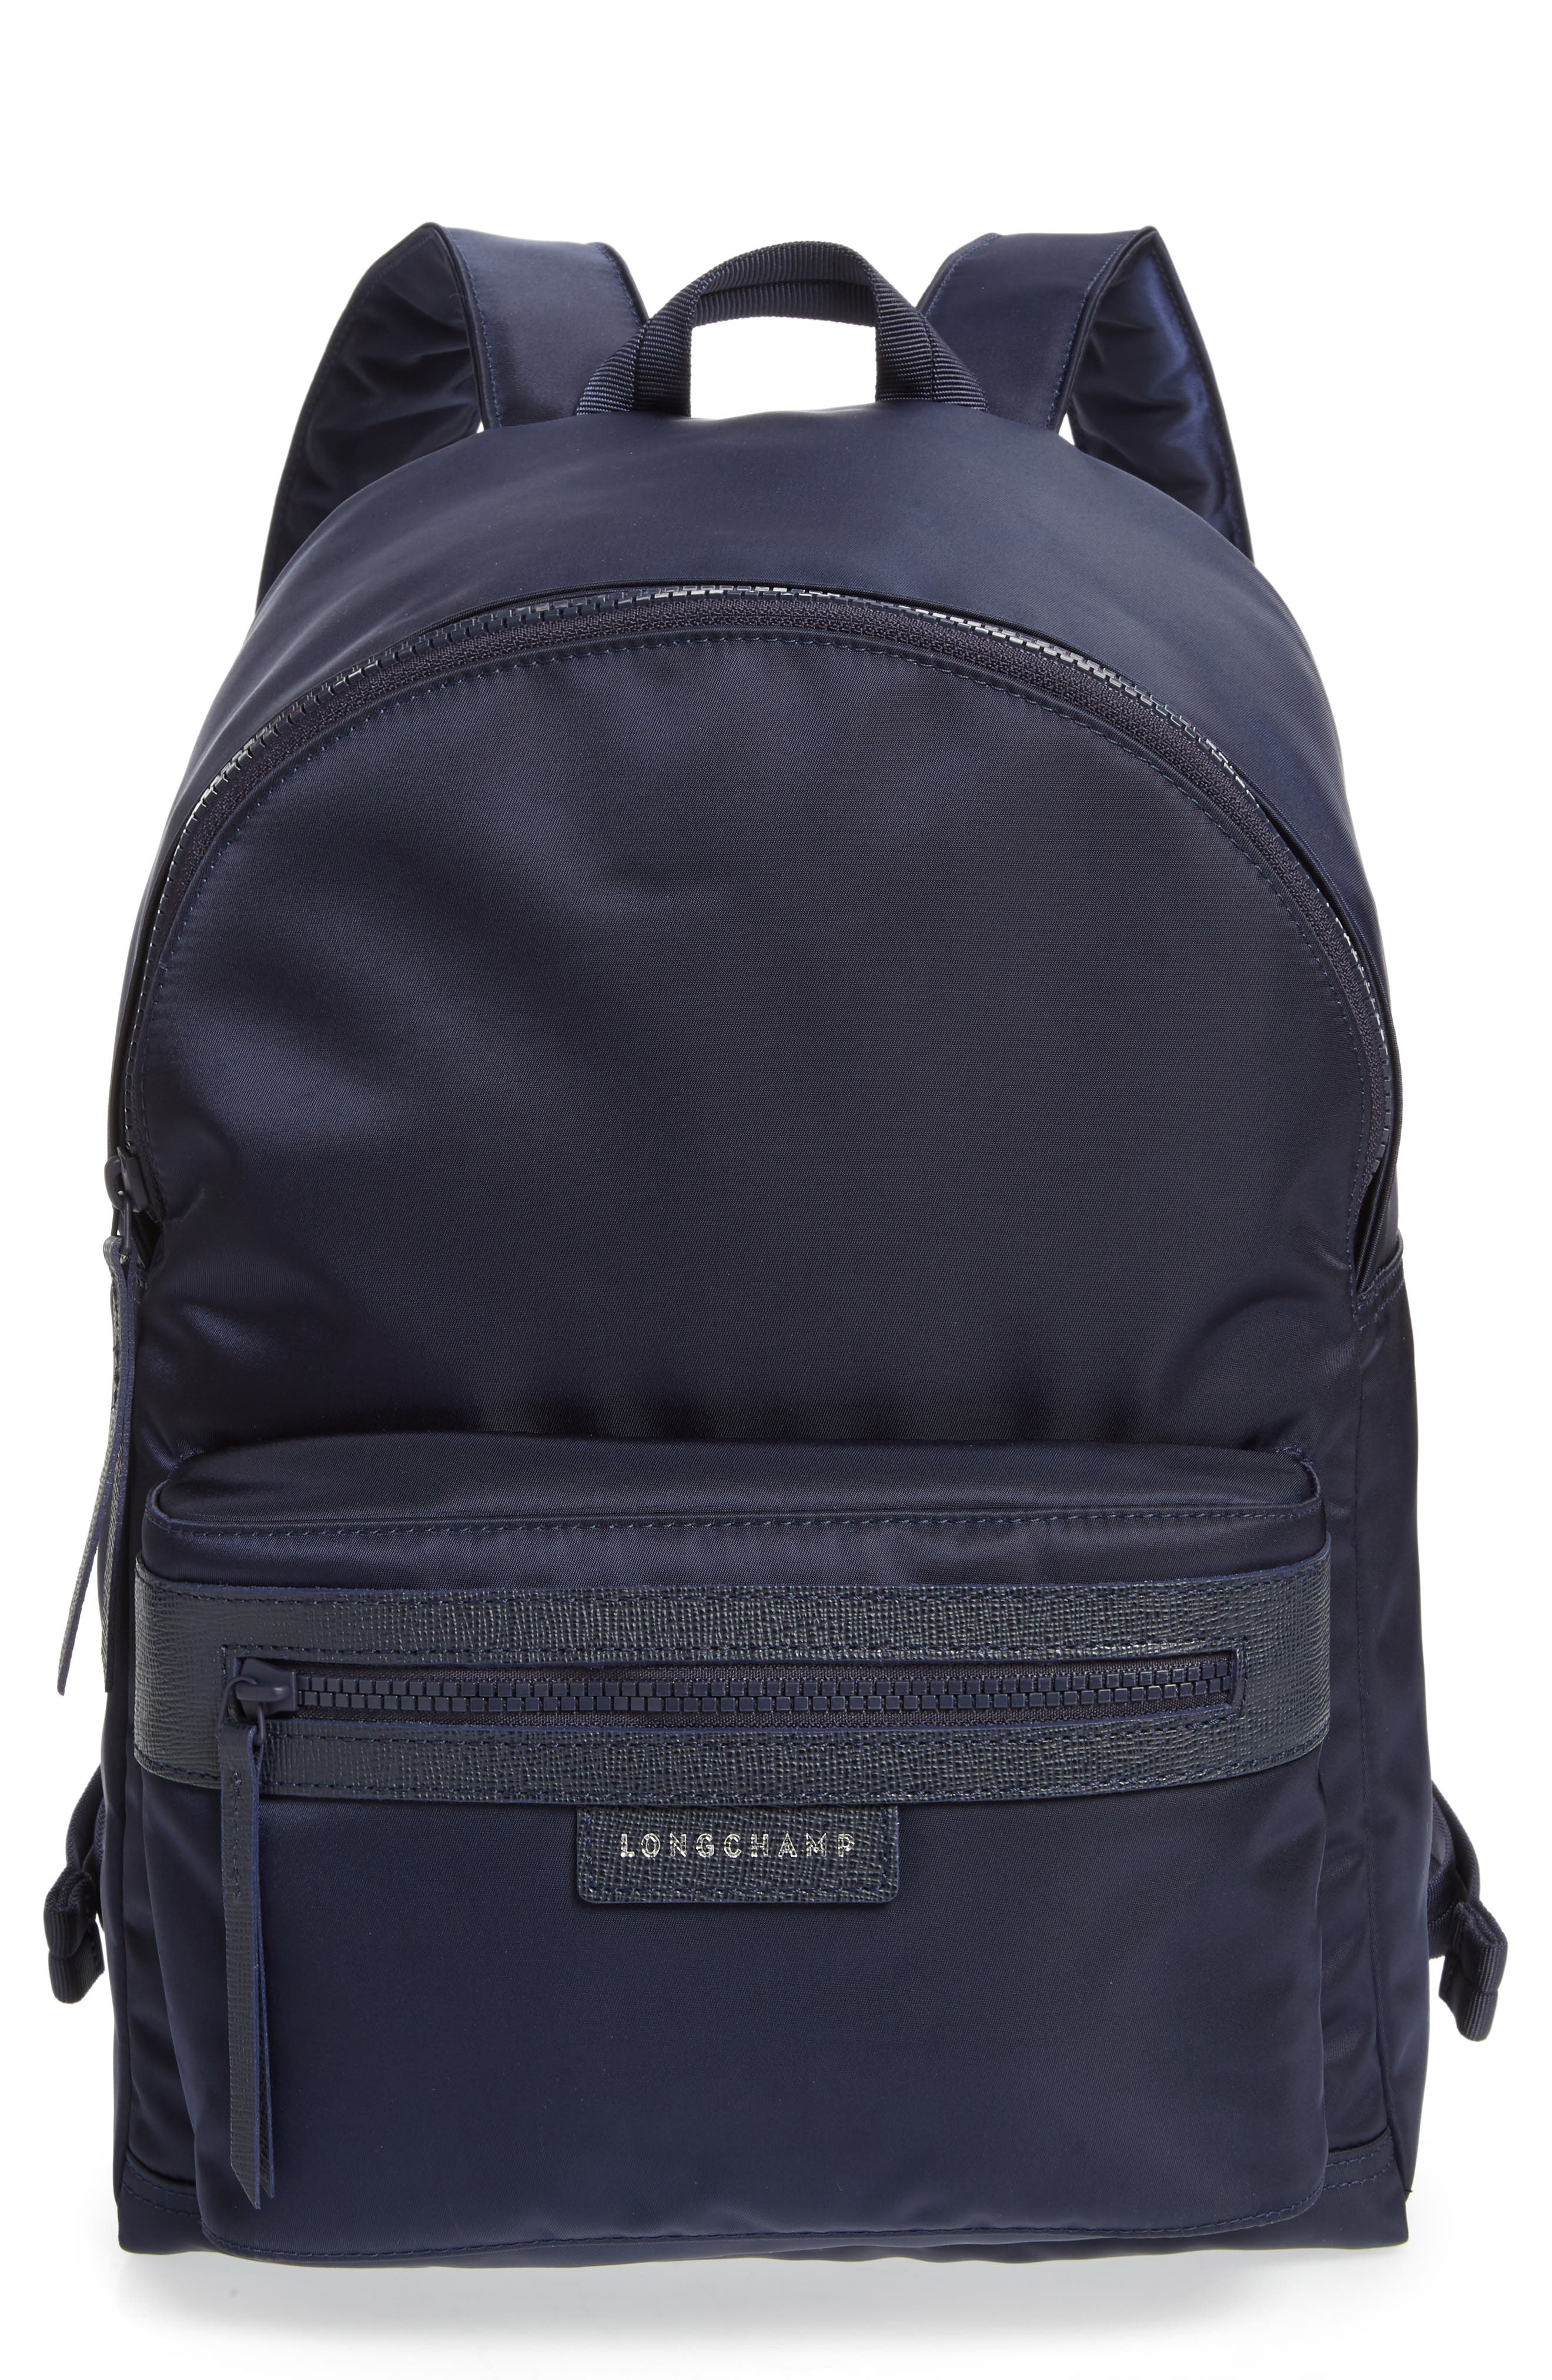 LONGCHAMP 'Le Pliage Neo' Nylon Backpack - Blue in Navy Blue